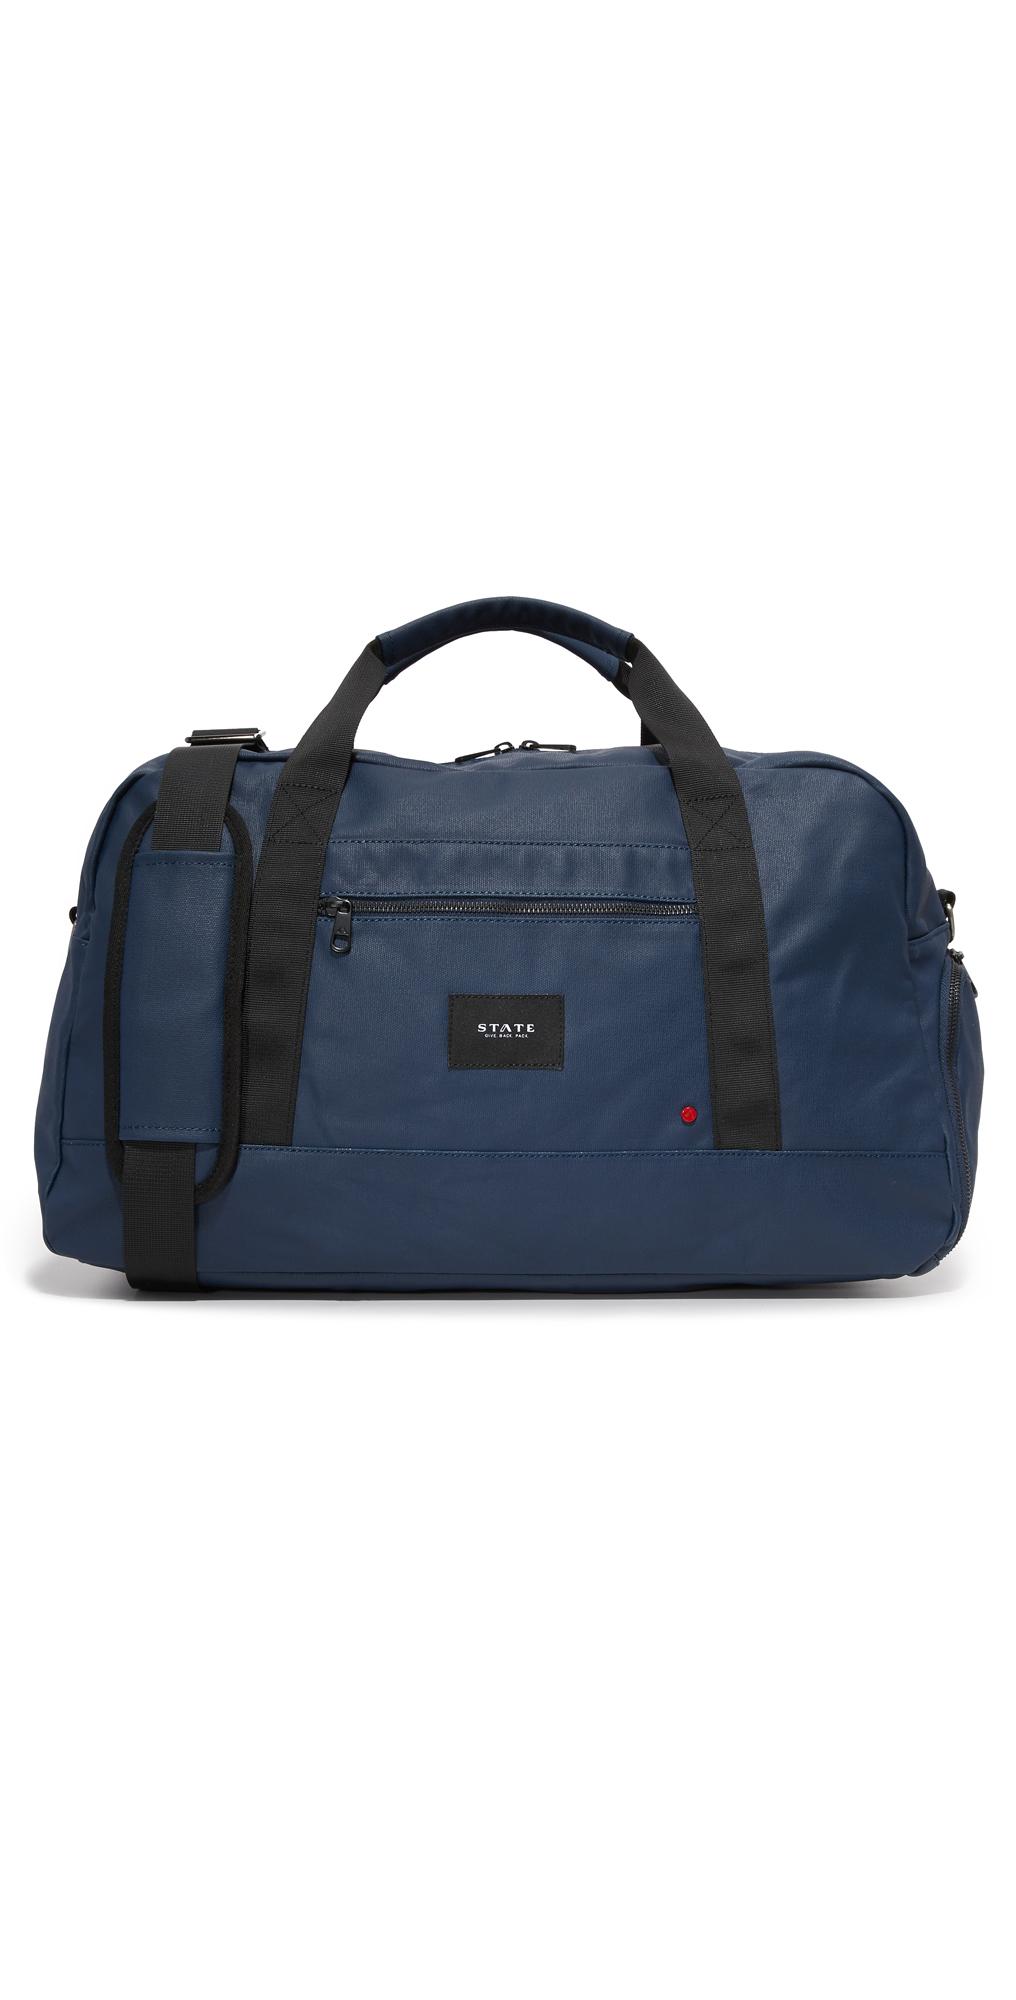 Franklin Duffel Bag STATE